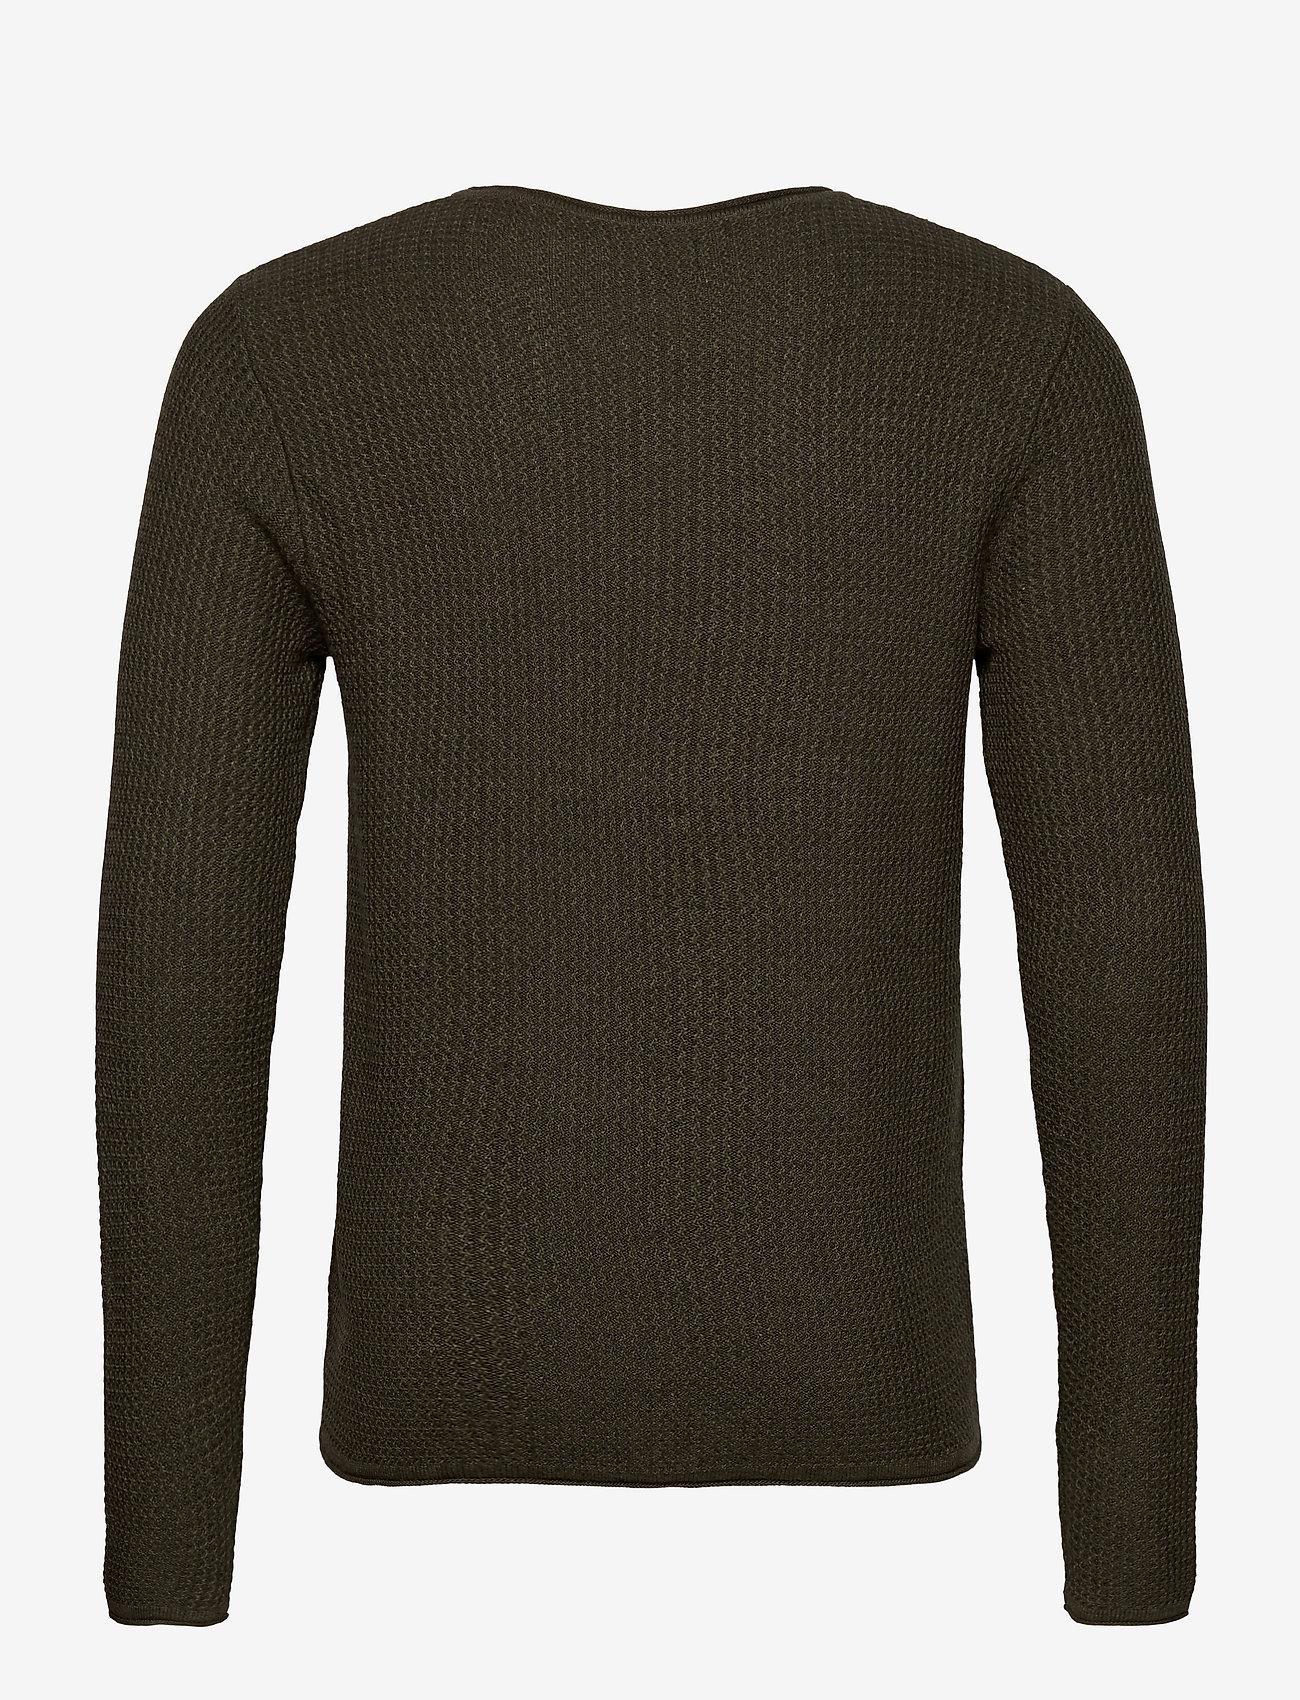 Jack & Jones - JPRBLUCARLOS KNIT CREW NECK NOOS - tricots basiques - olive night - 1